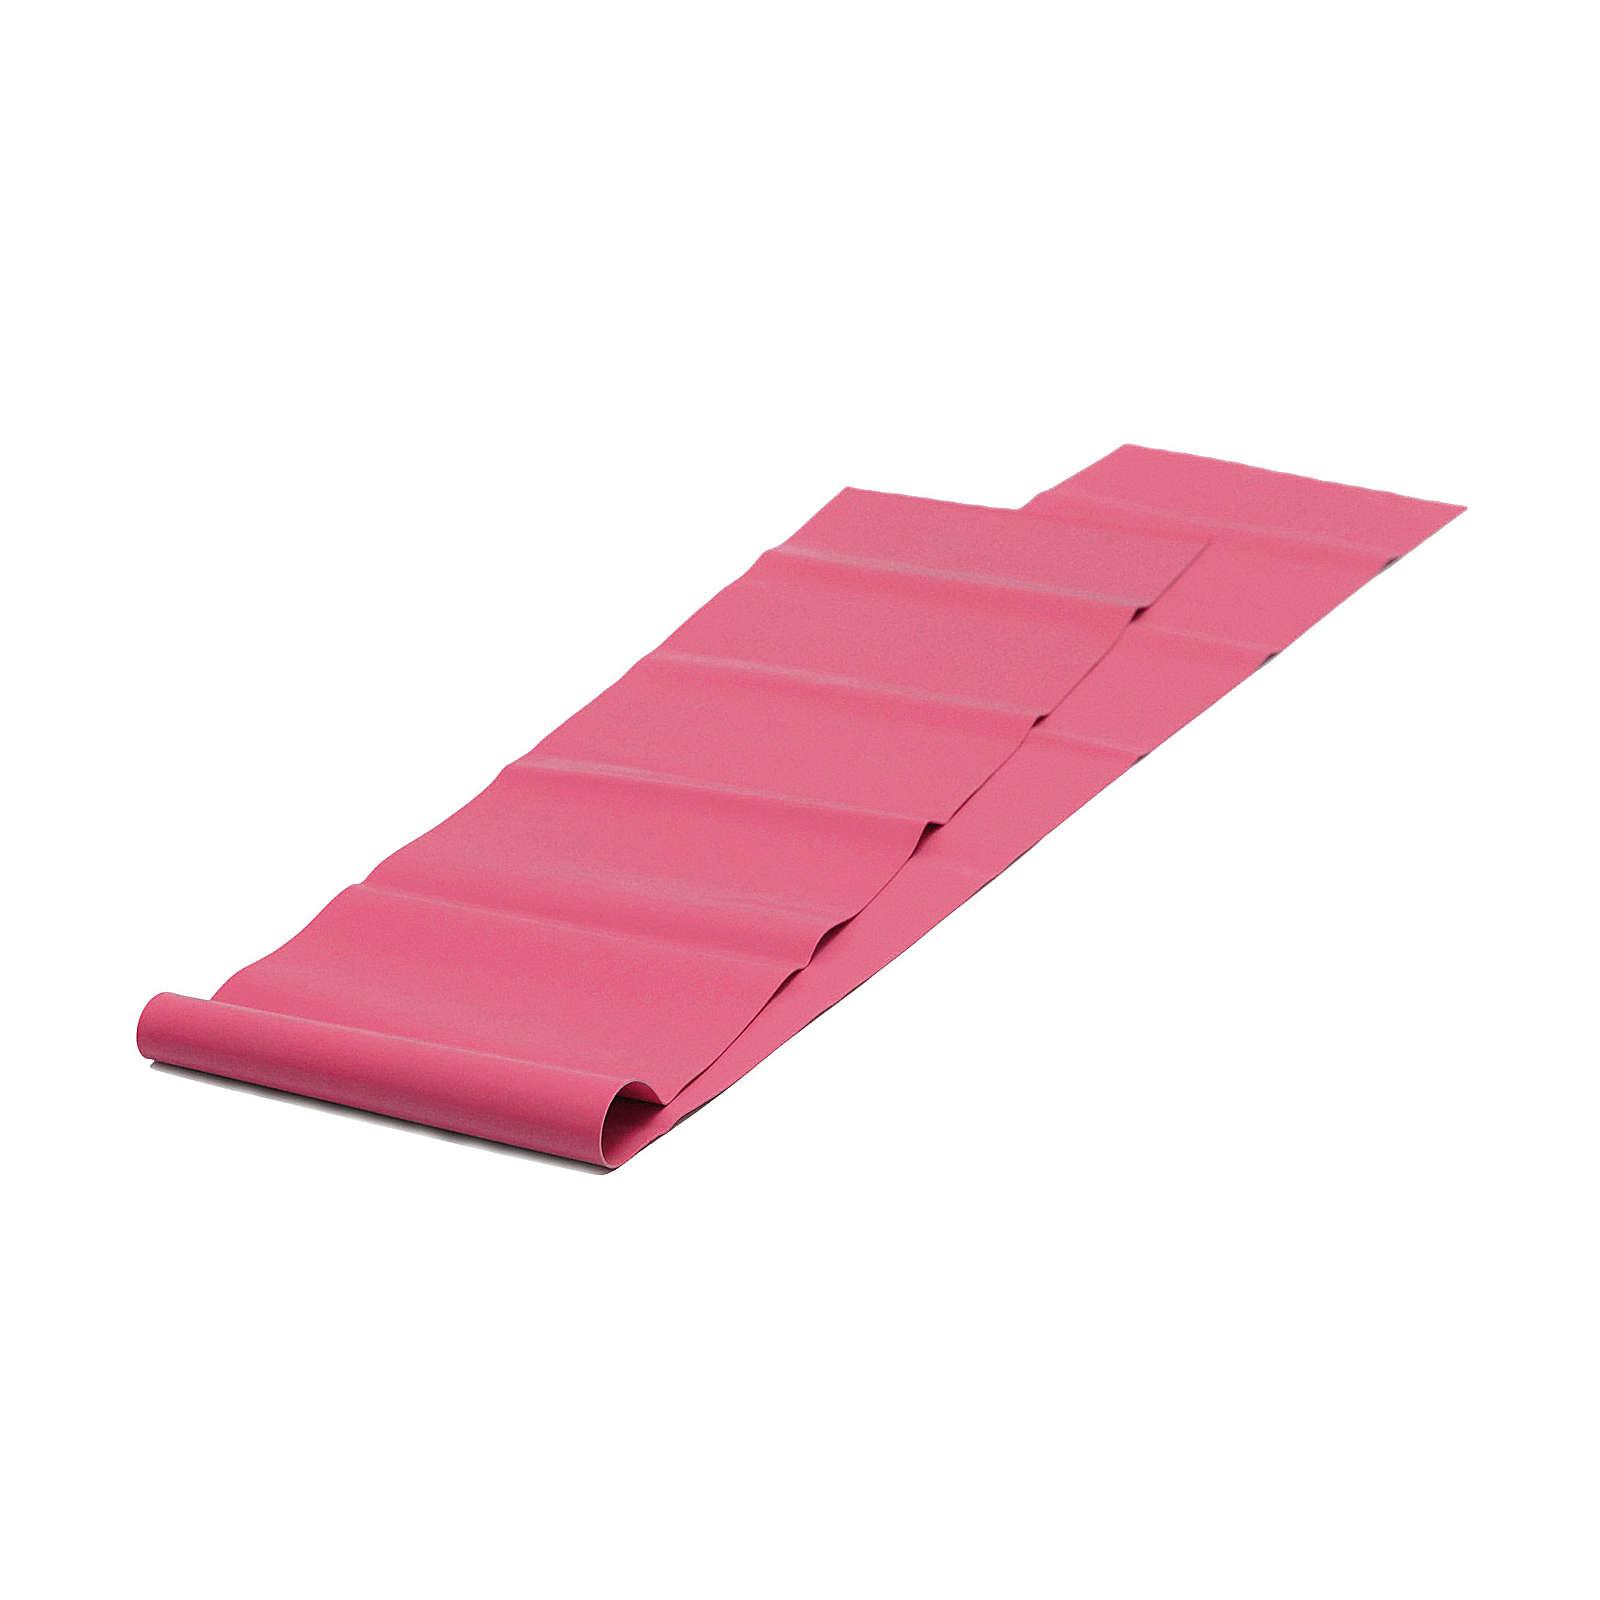 Yogistar Pilates Stretchband - latexfrei Fitnesszubehör rot